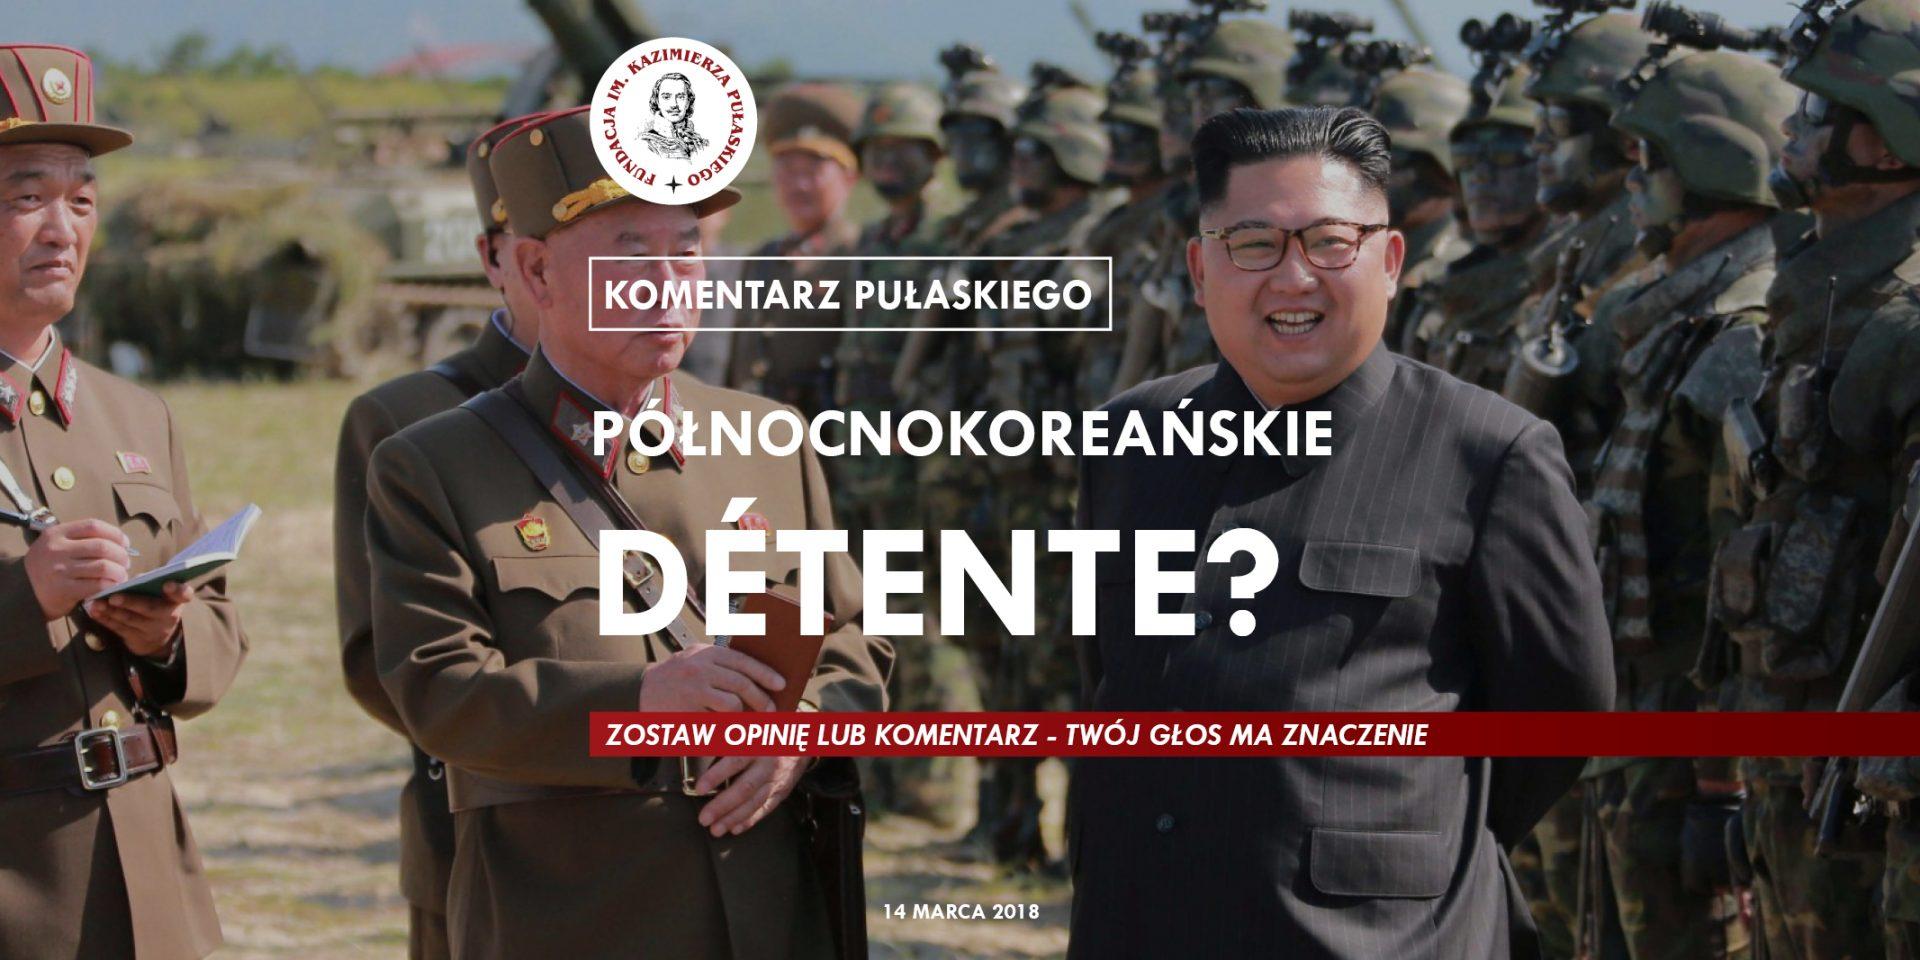 KOMENTARZ PUŁASKIEGO: Północnokoreańskie détente?